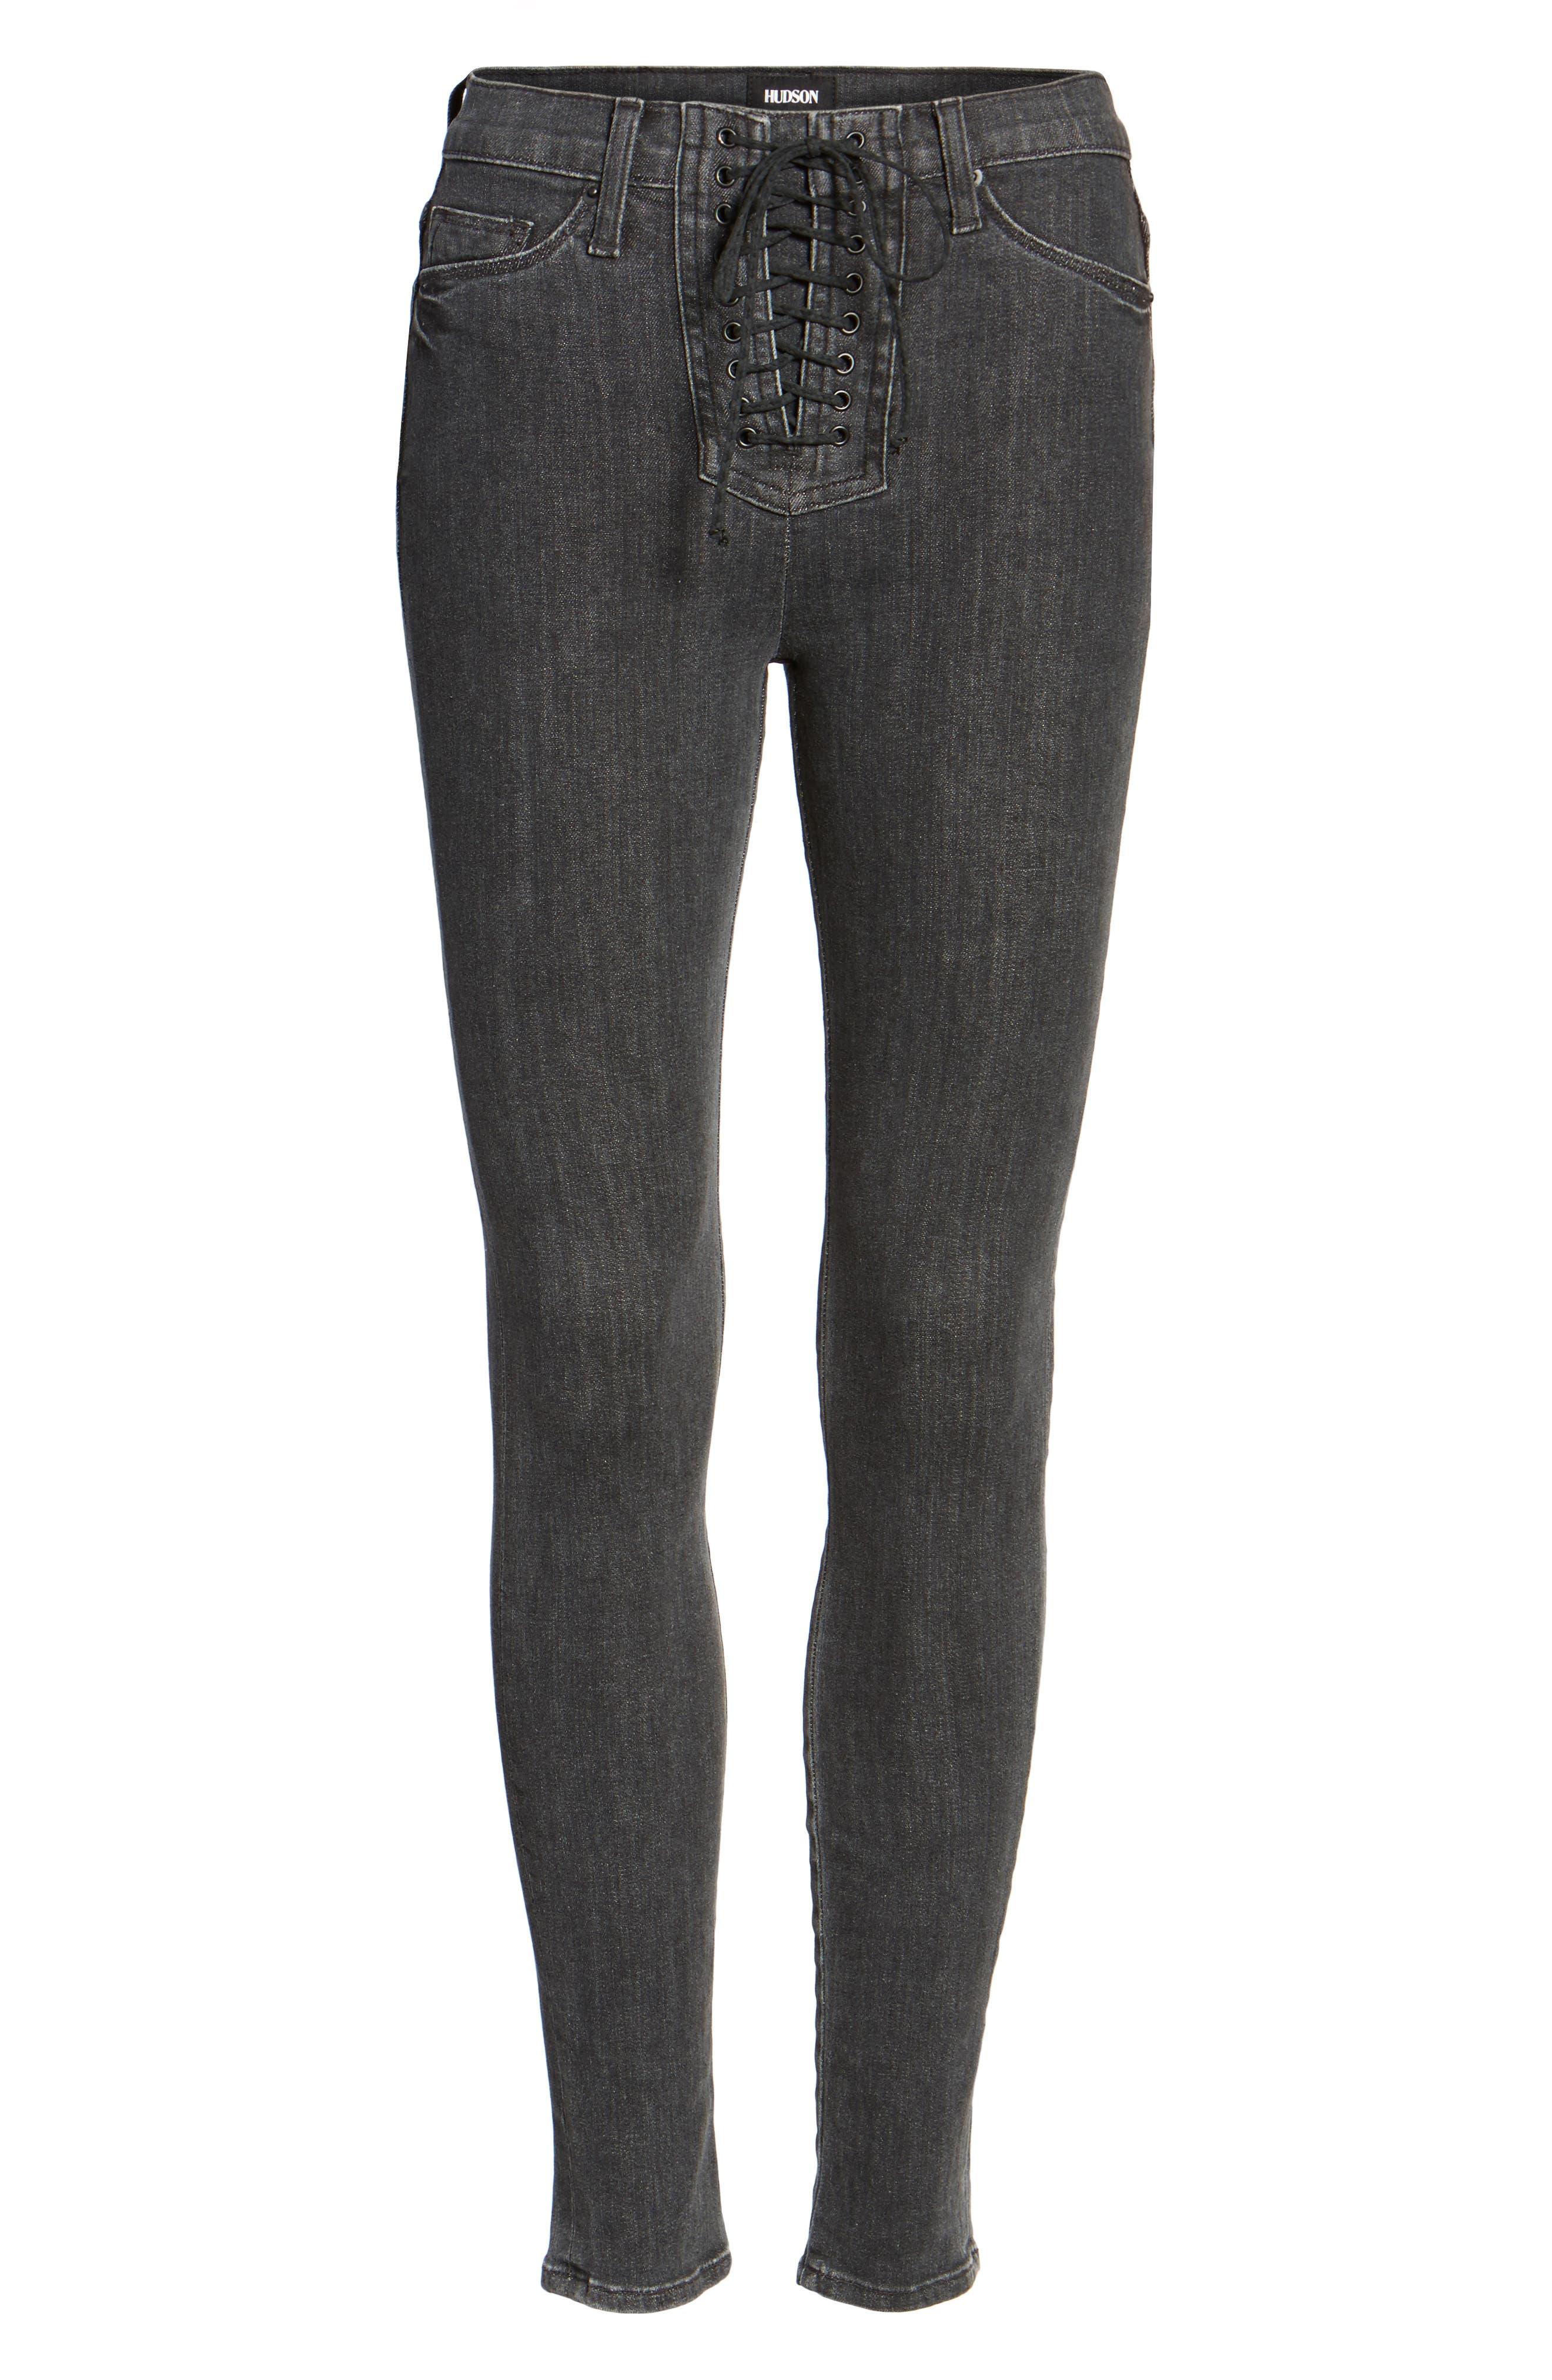 Bullocks High Waist Lace-Up Skinny Jeans,                             Alternate thumbnail 6, color,                             001